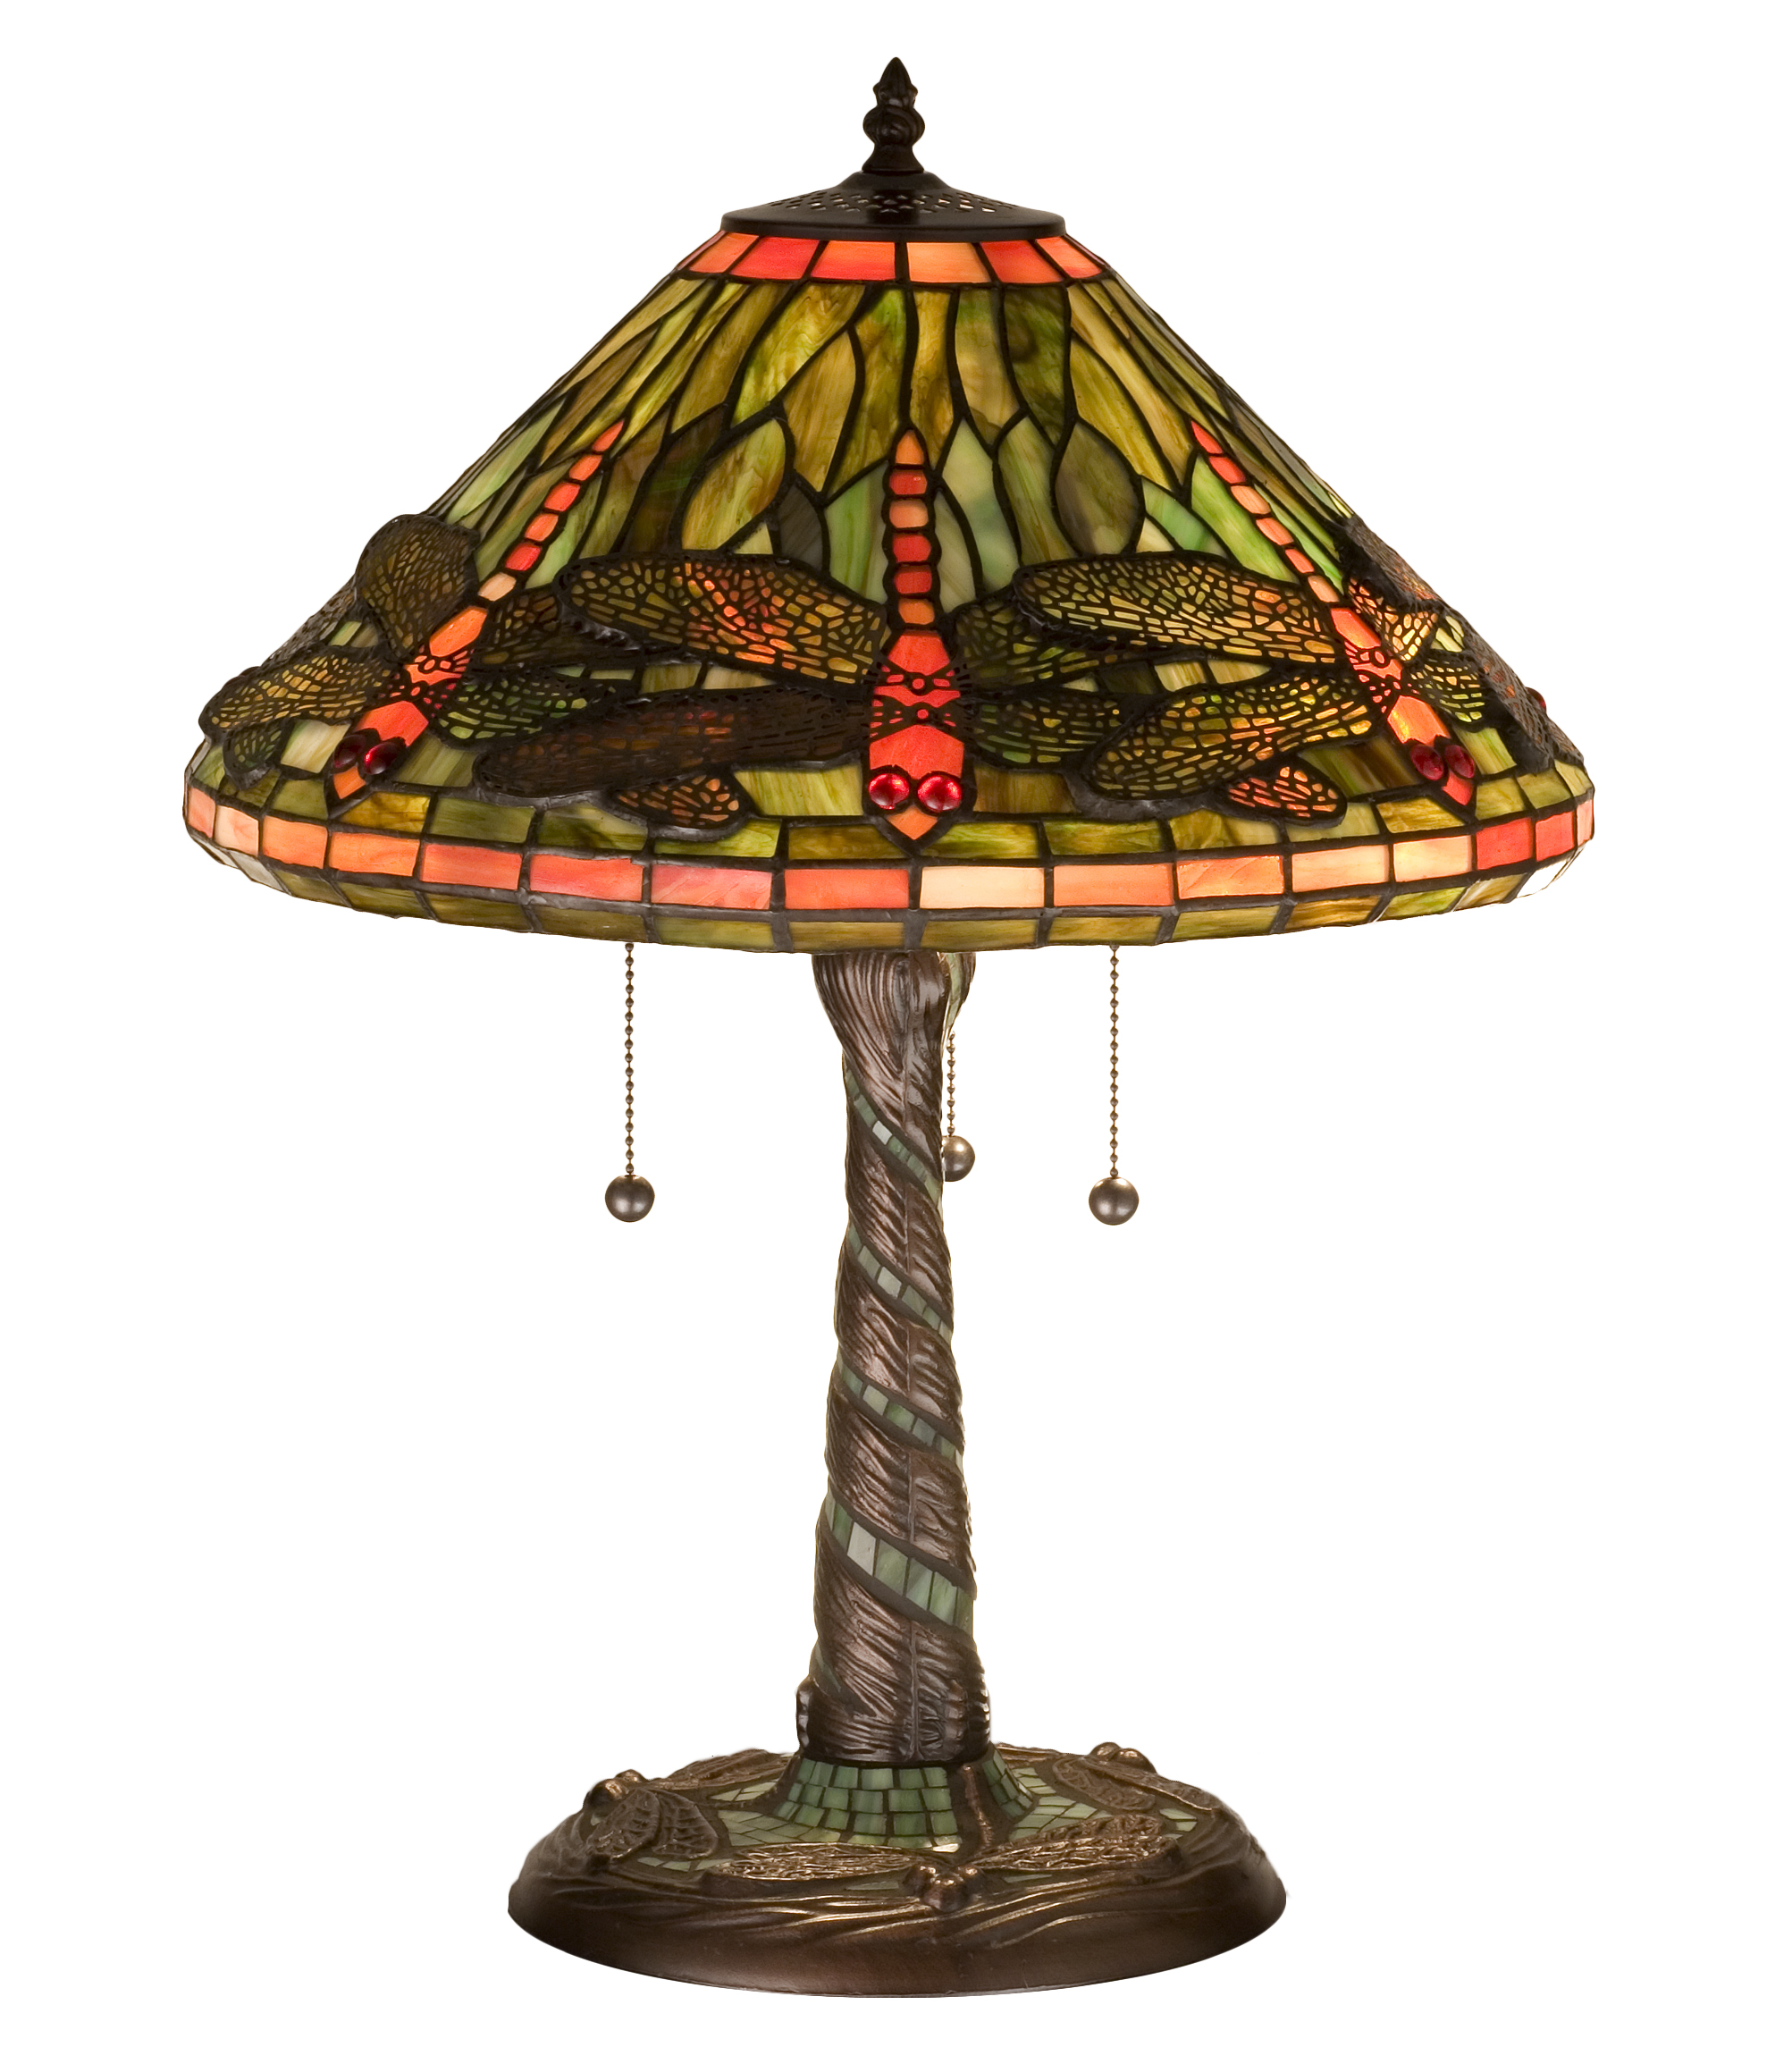 Picture of: Meyda 21 H Tiffany Dragonfly W Twisted Fly Mosaic Base Table Lamp Walmart Com Walmart Com